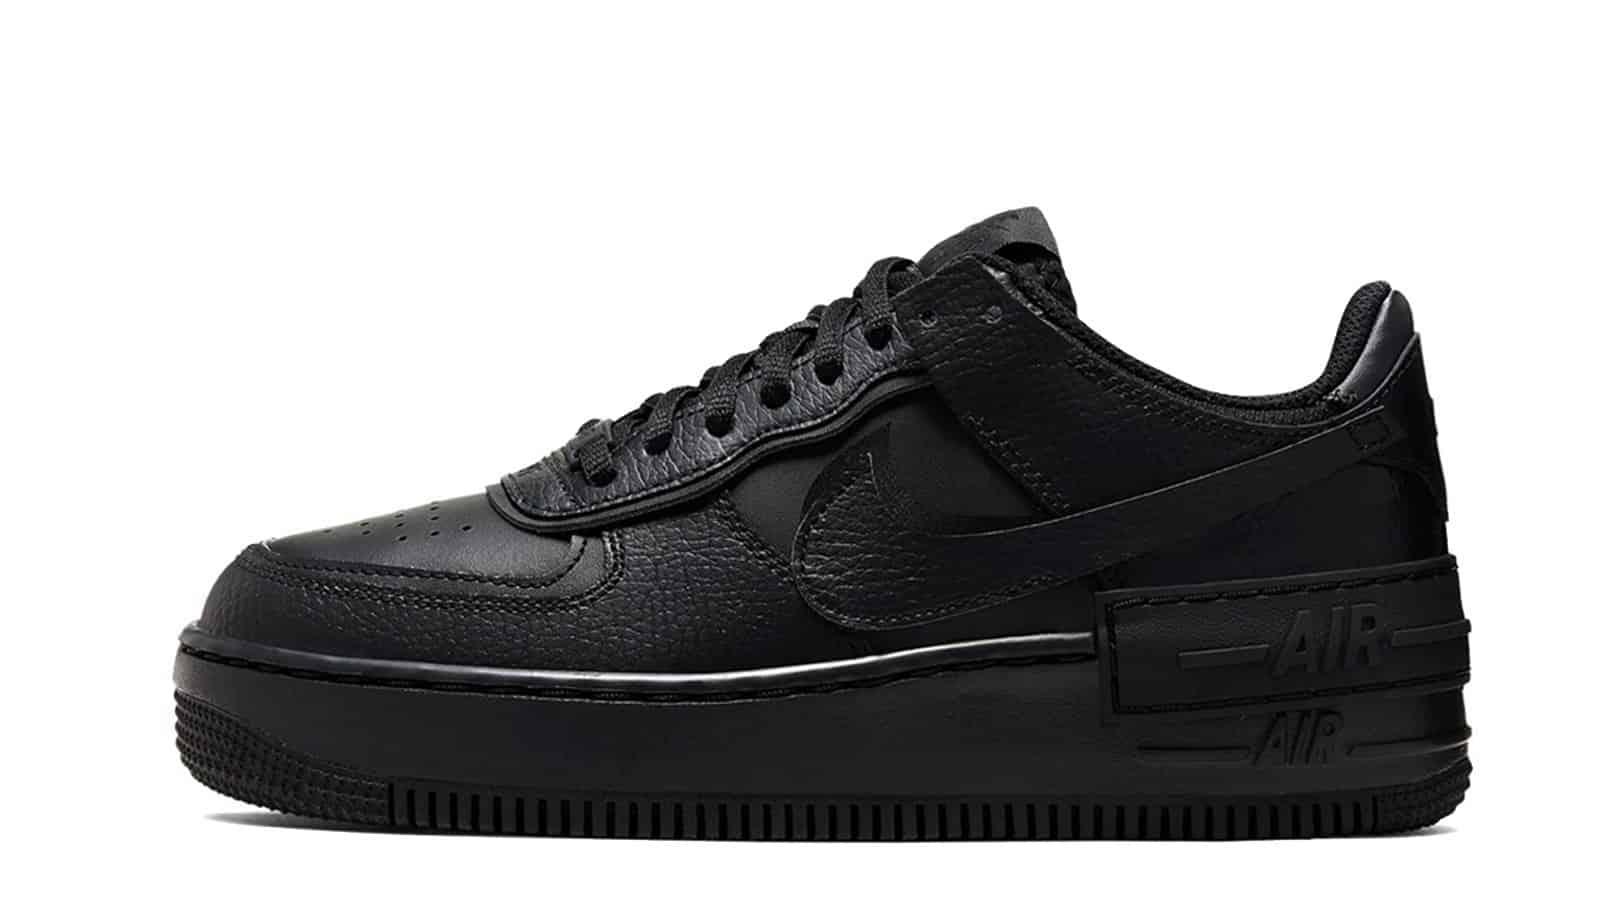 Nike Air Force 1 Shadow Black